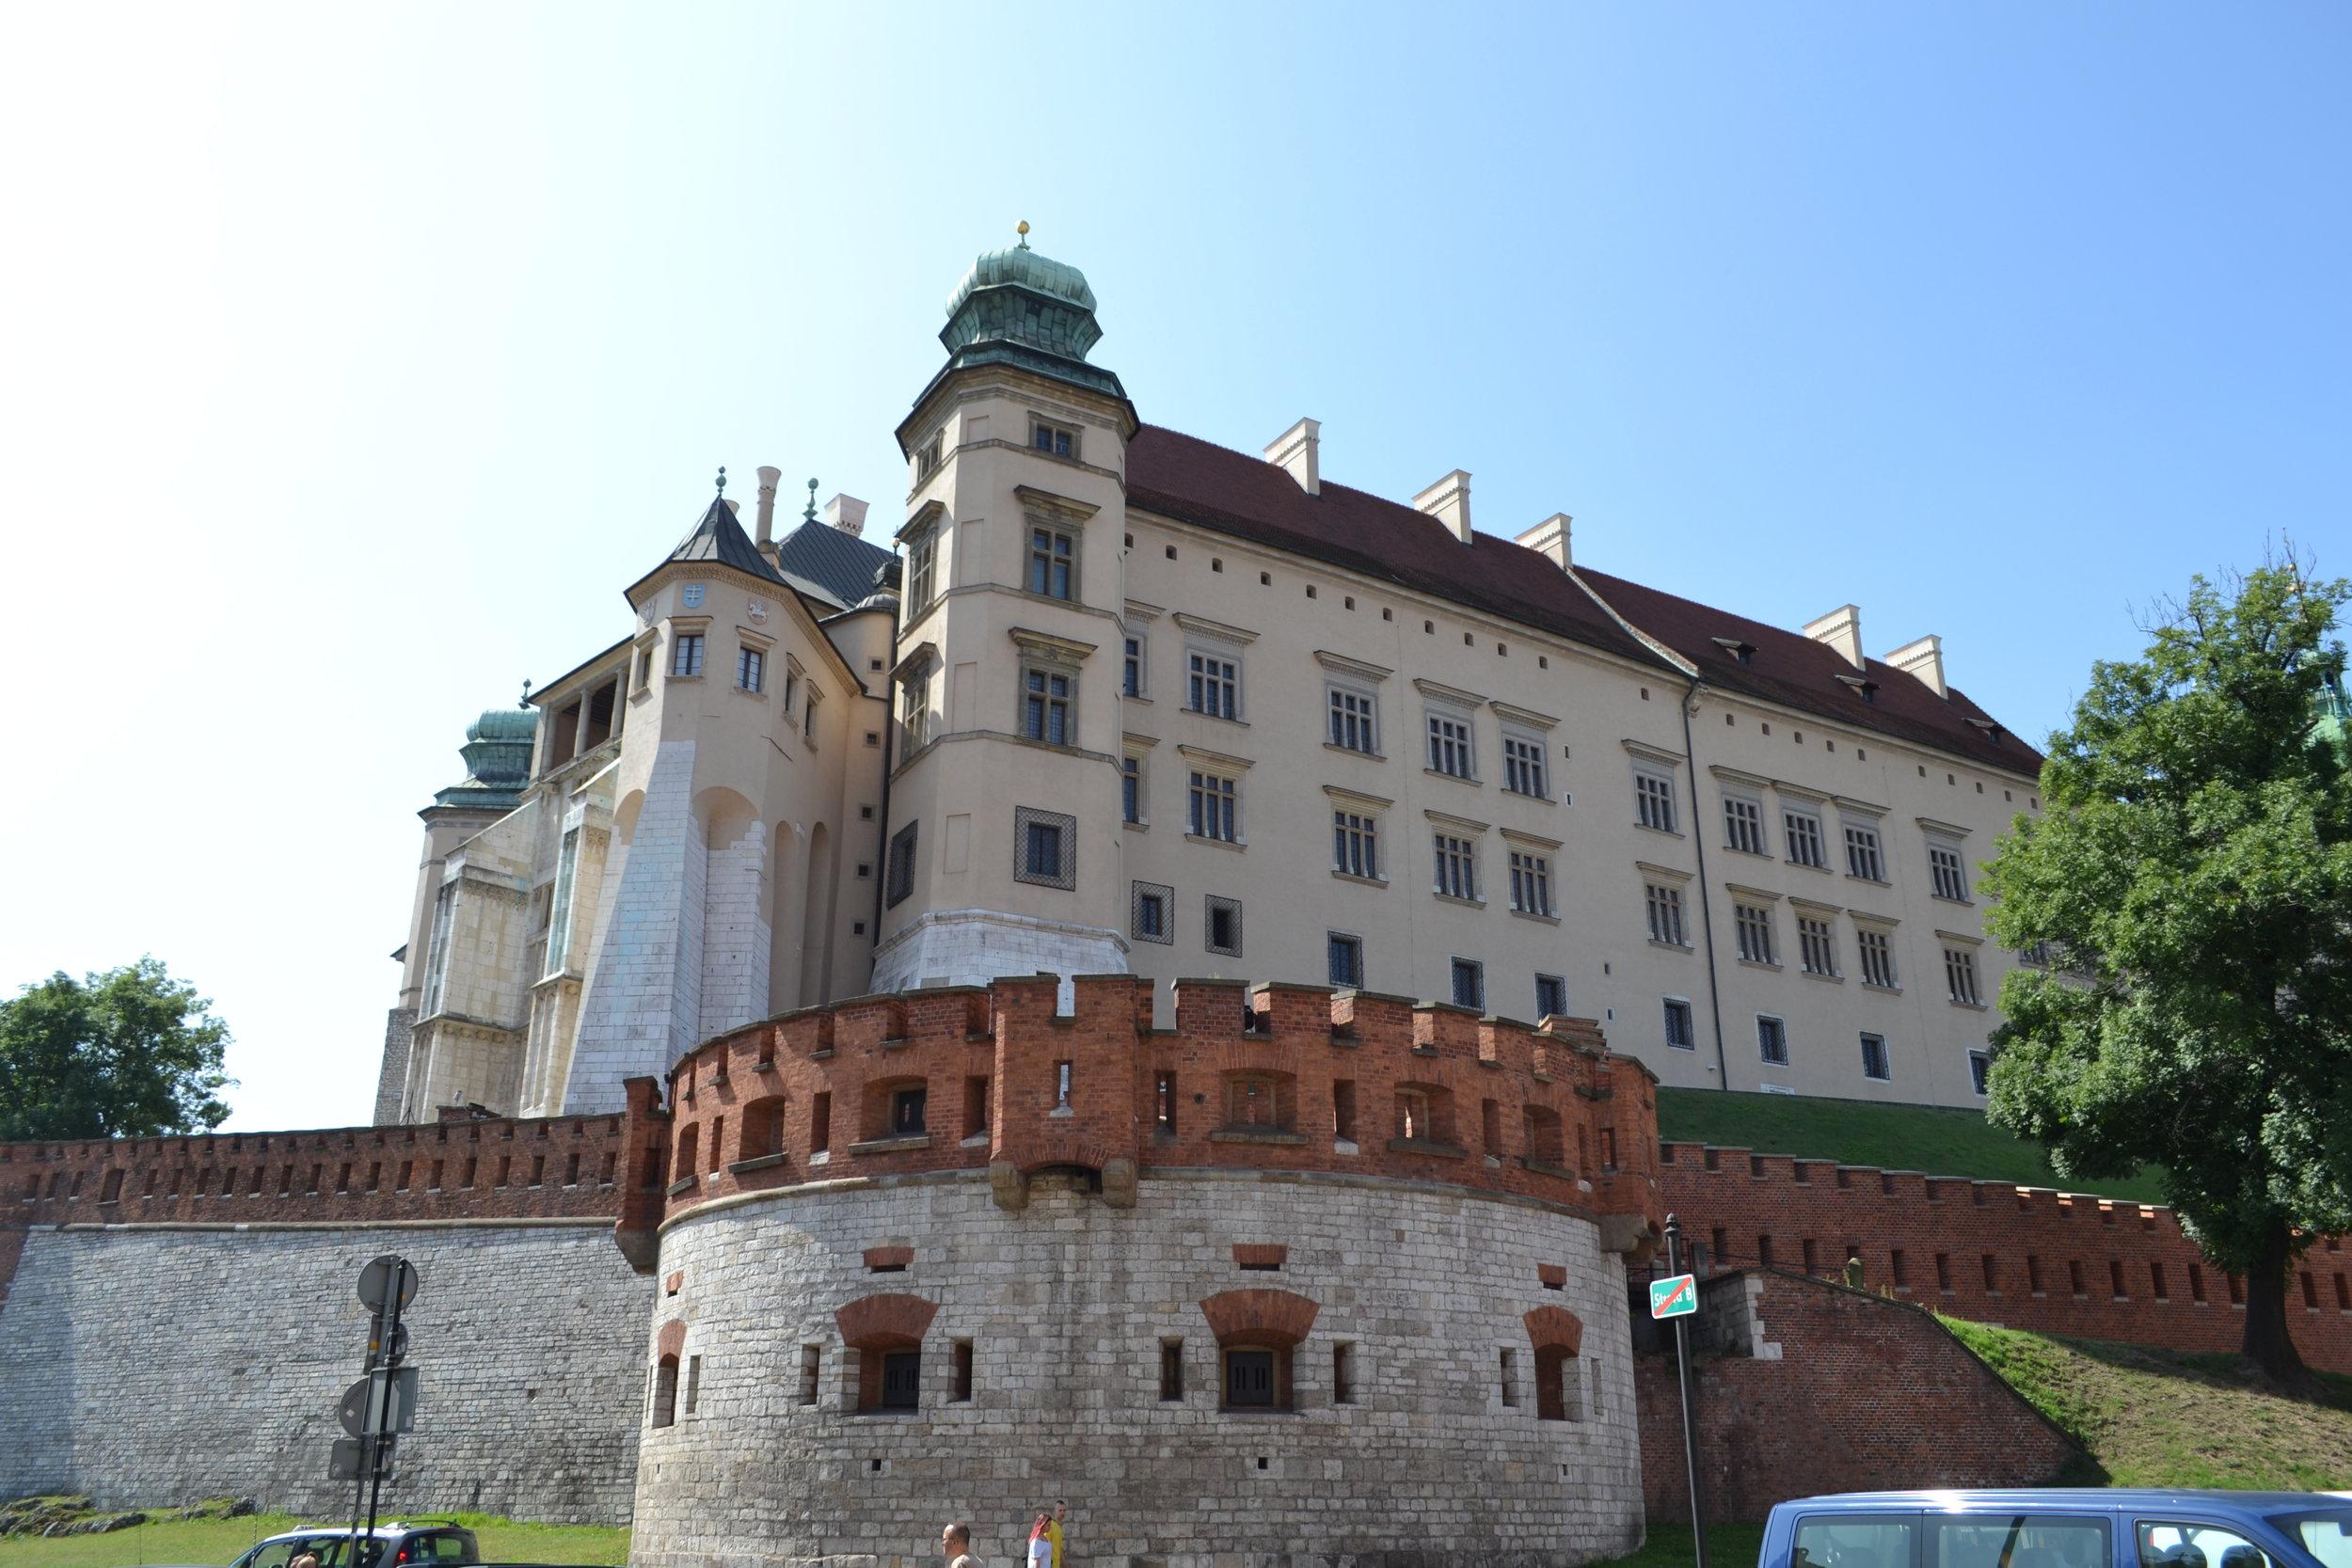 Wawel Castle Exterior